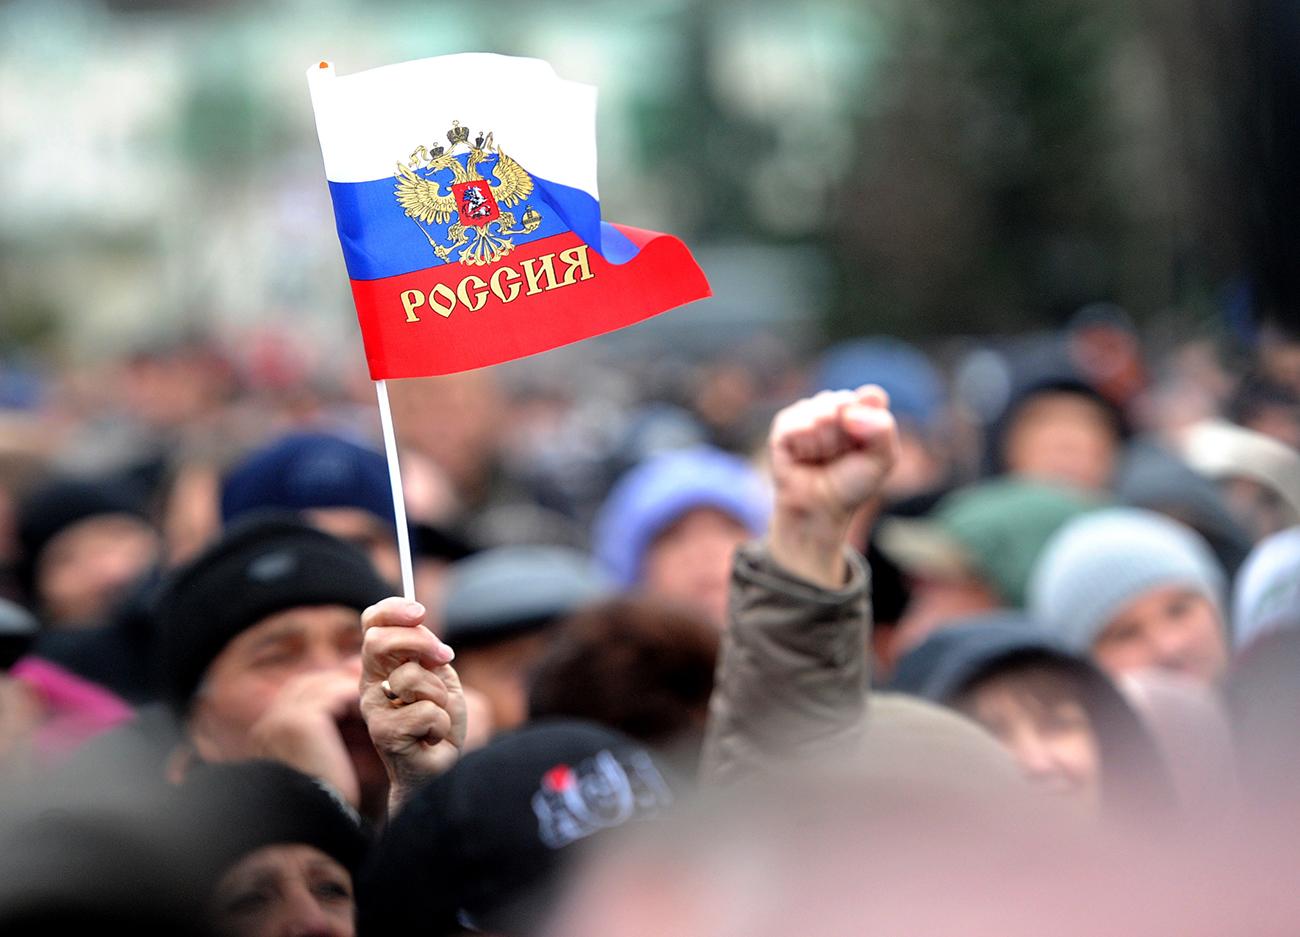 Menyusul kudeta di Kiev, Ukraina pada 2014, rakyat Krimea memilih untuk bergabung kembali dengan Rusia dalam sebuah referendum.